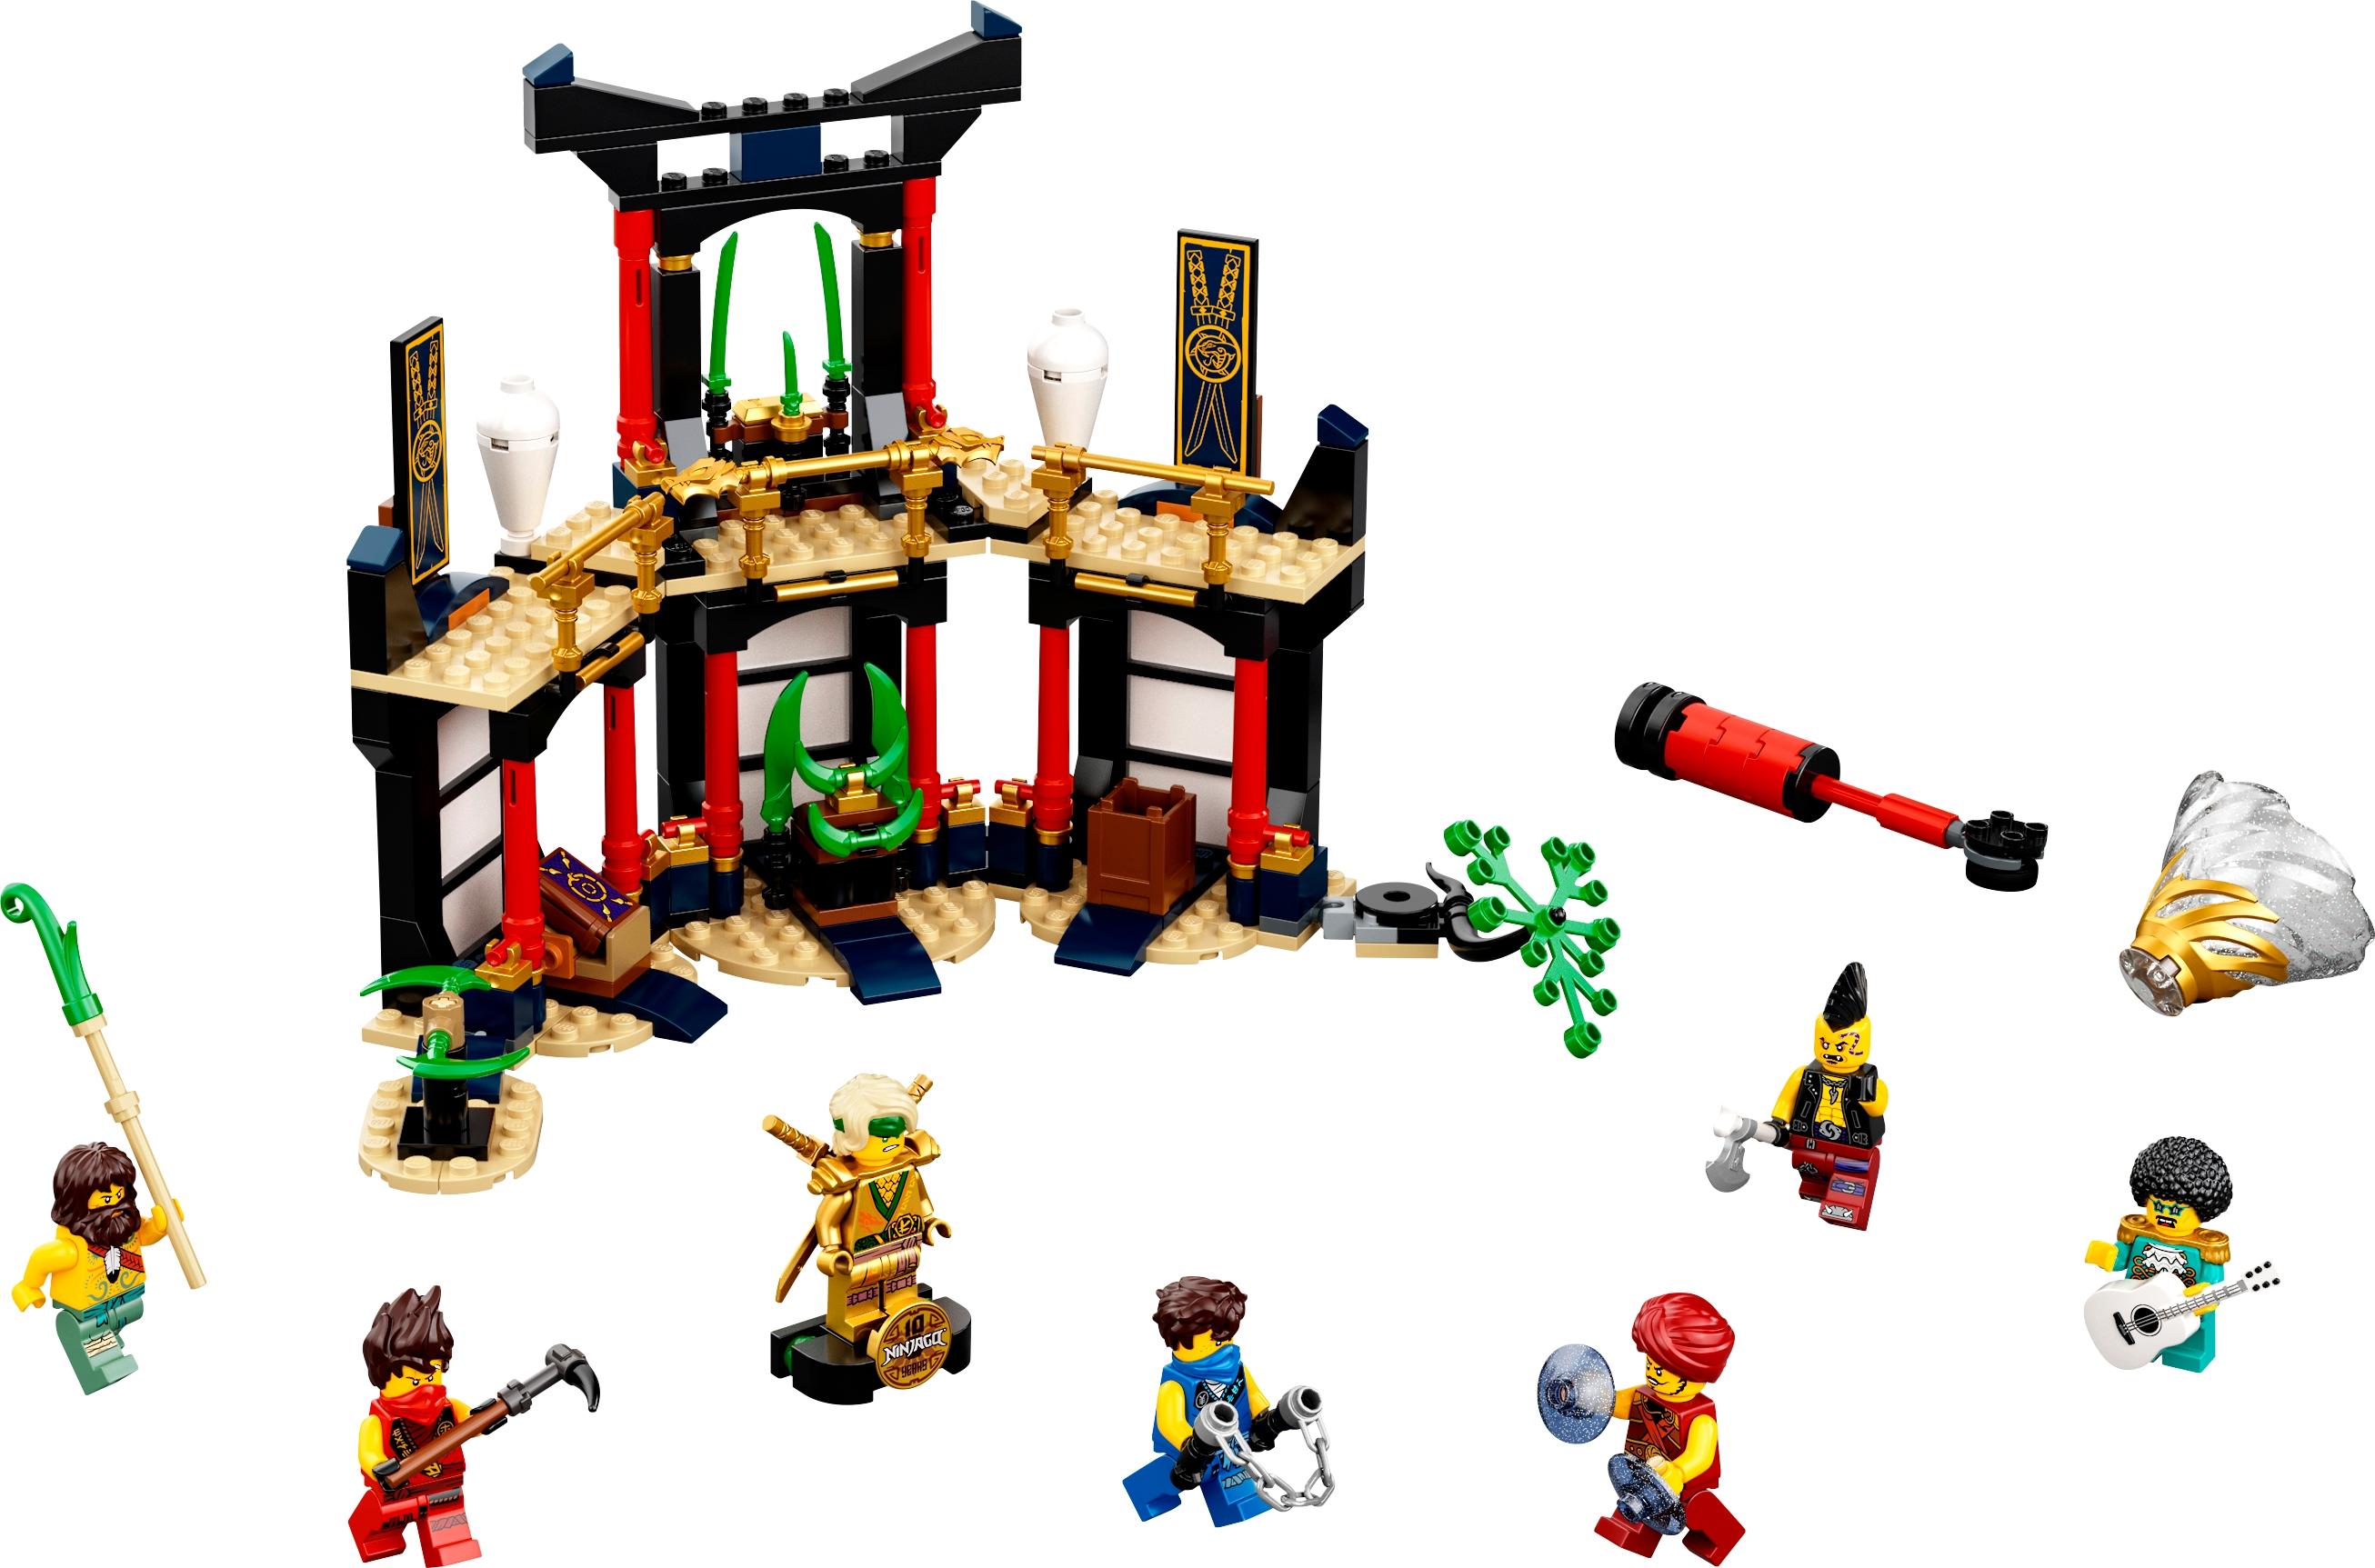 Tournament of Elements